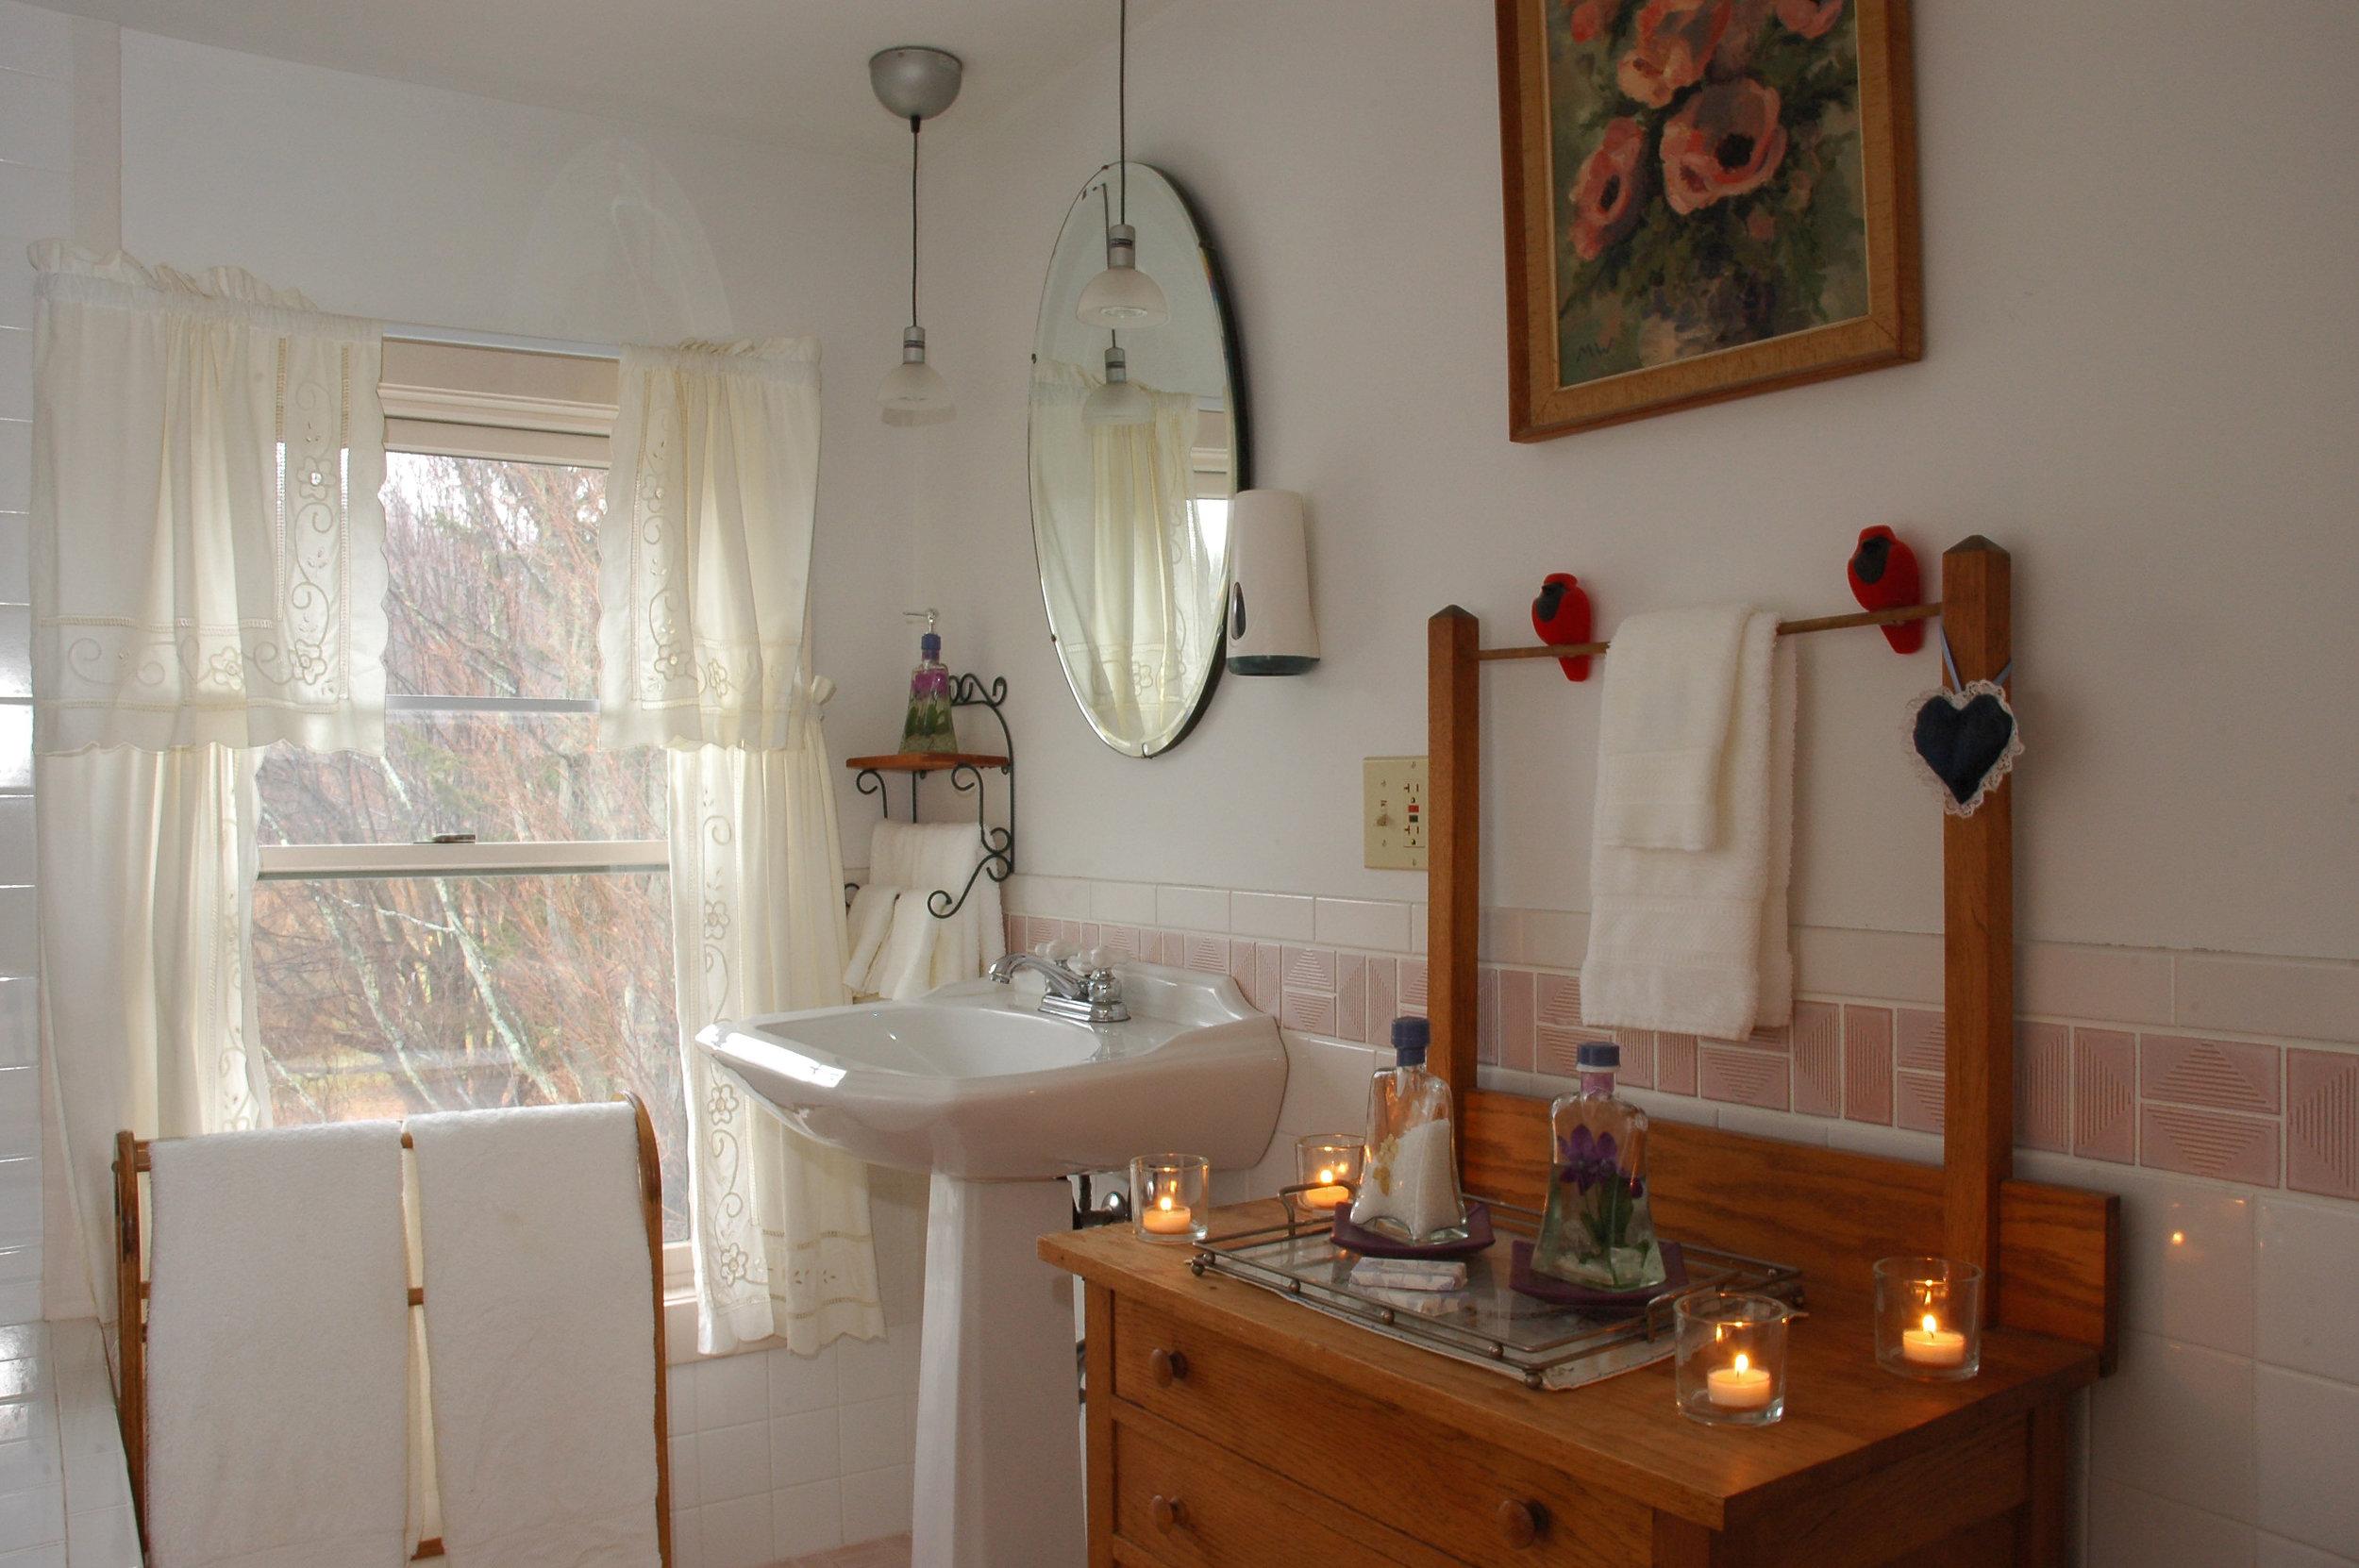 Catskill Suite bathroom sink area